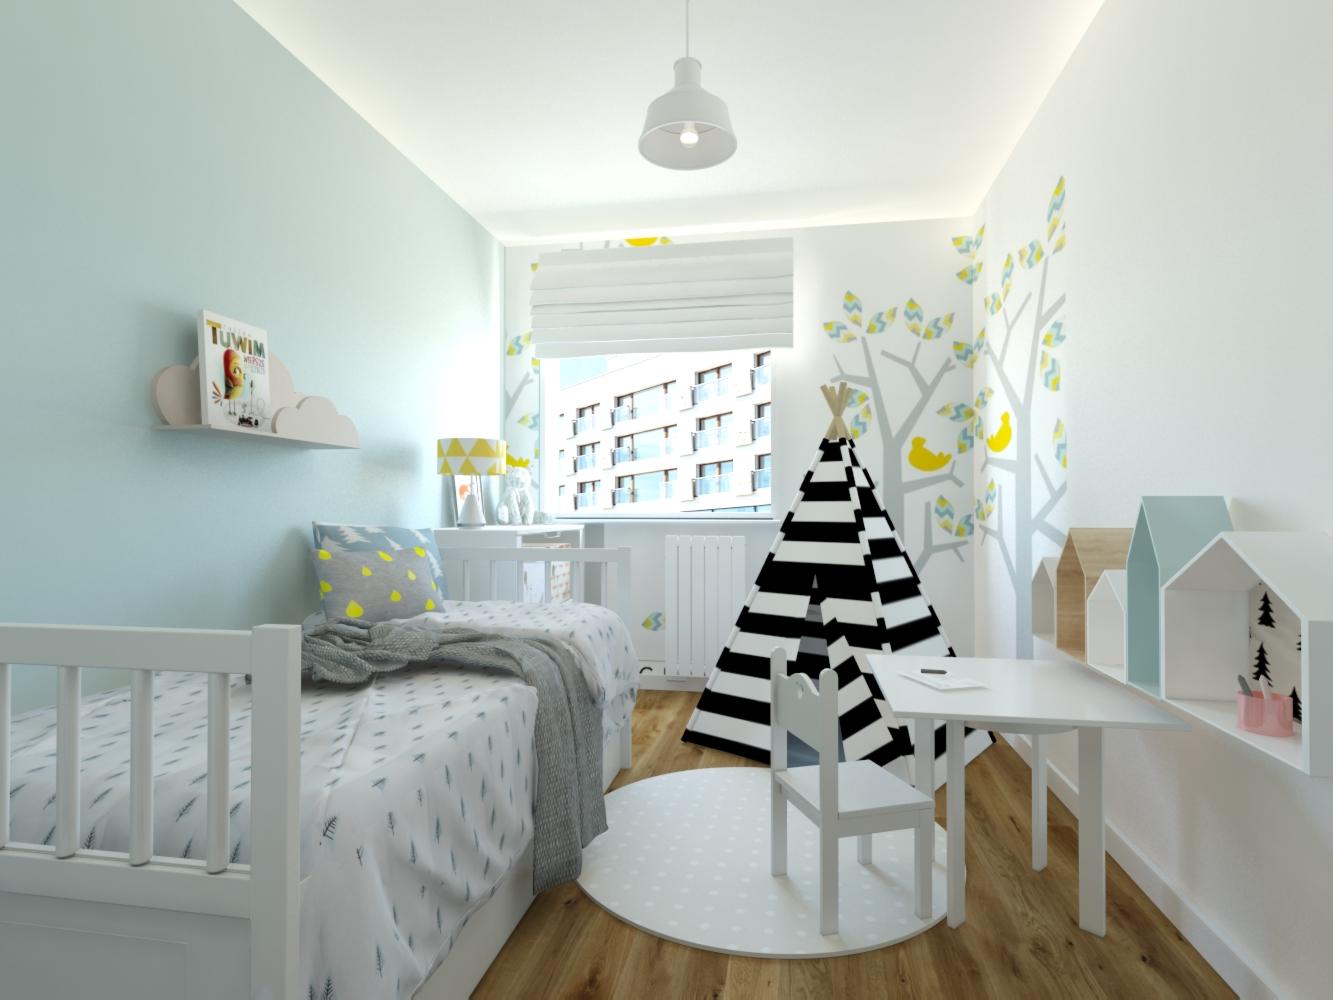 pok j dla dziewczynki aleksandra jankowska. Black Bedroom Furniture Sets. Home Design Ideas